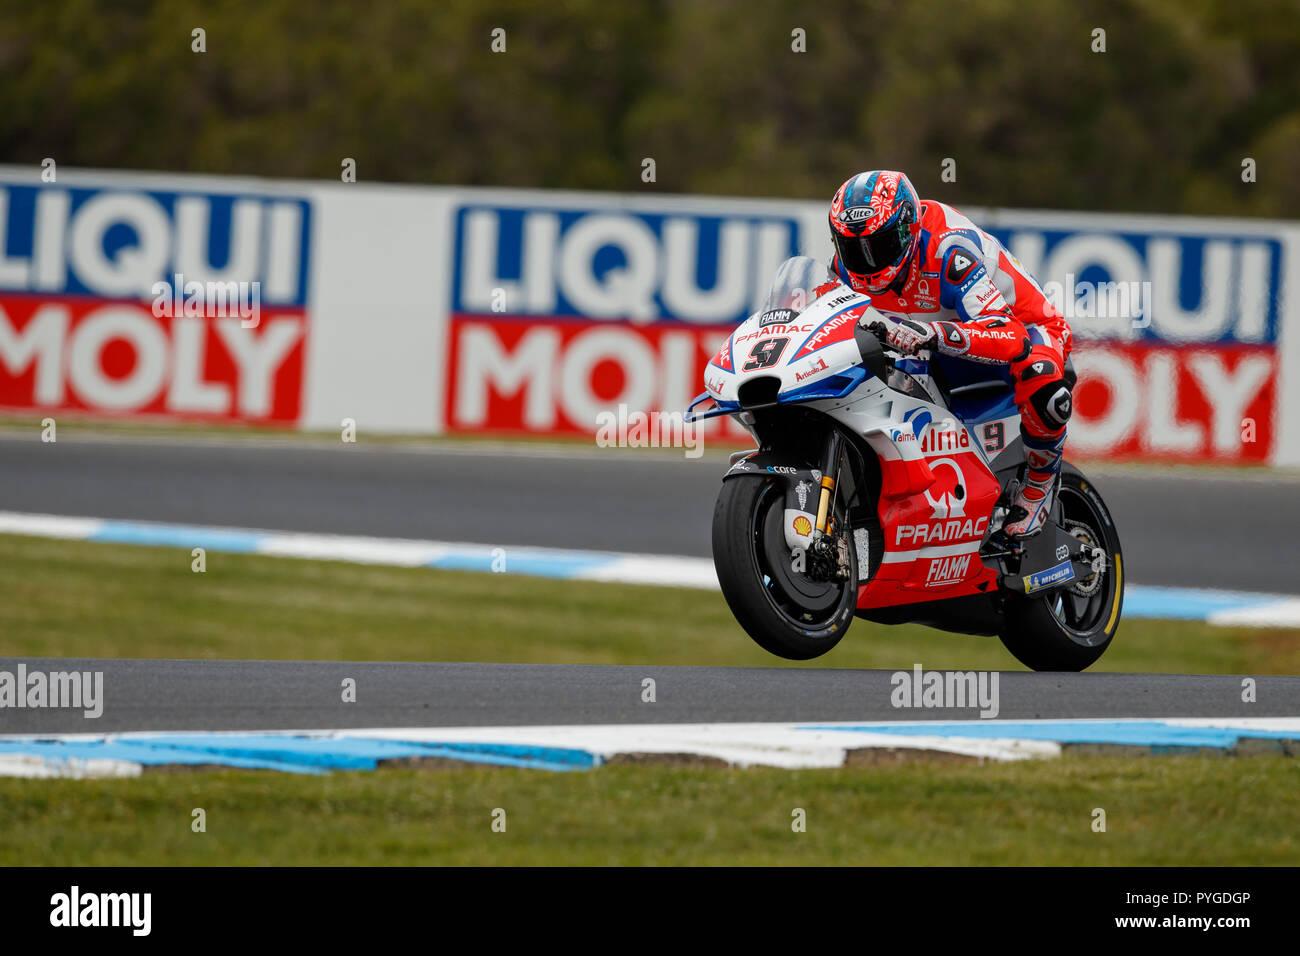 Melbourne, Australia. Sunday, 28 October, 2018. Phillip Island, Australia. Warm up. Danilo Petrucci, Alma Pramac Ducati MotoGP Team. Credit: Russell Hunter/Alamy Live News - Stock Image